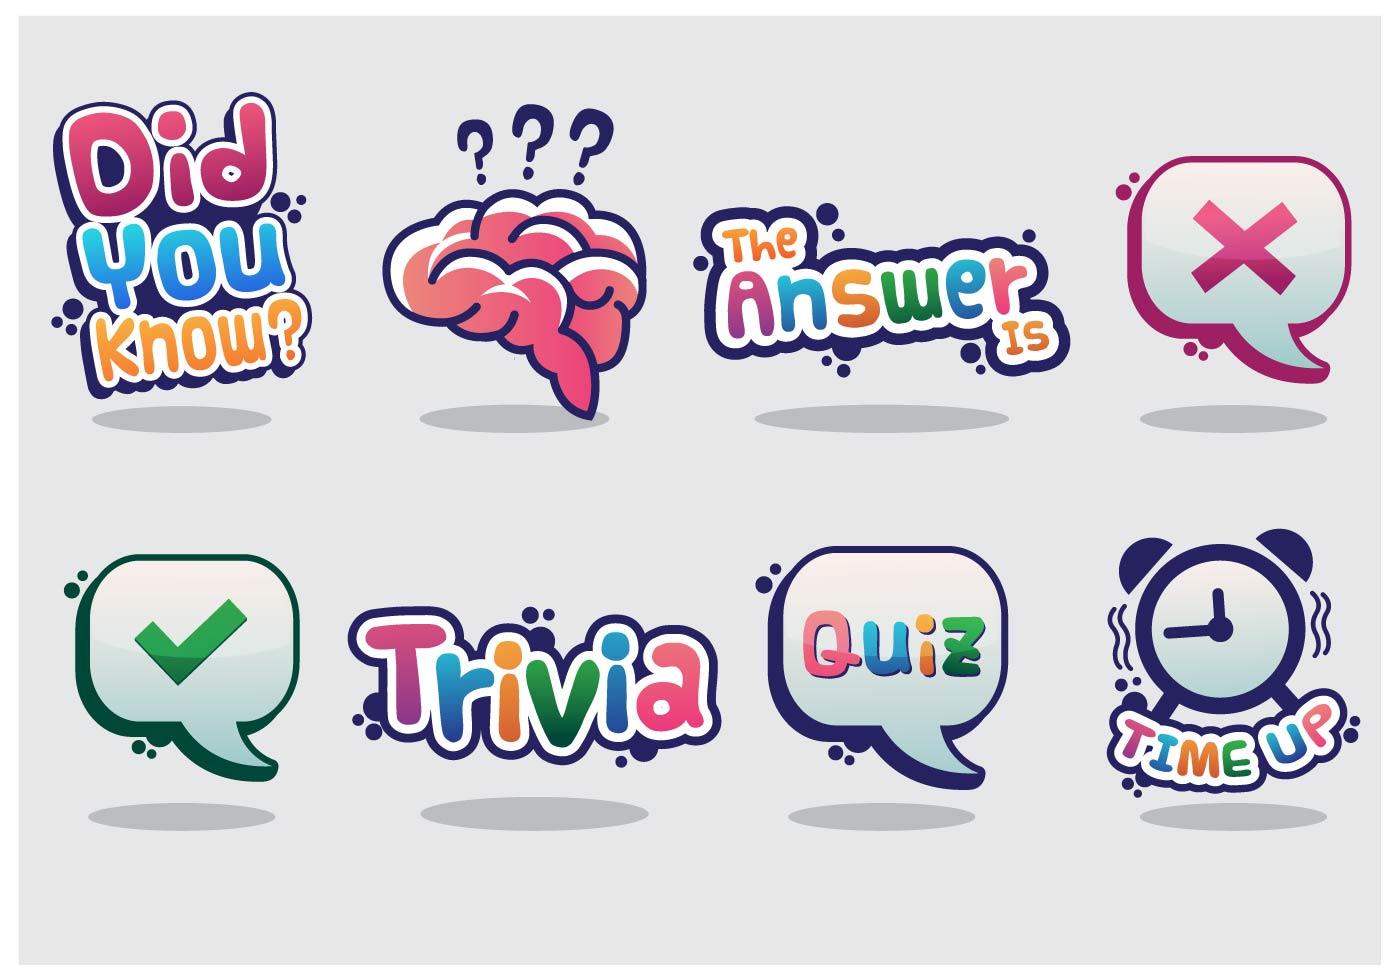 Trivia Vector Sticker - Download Free Vector Art, Stock ... - photo#19